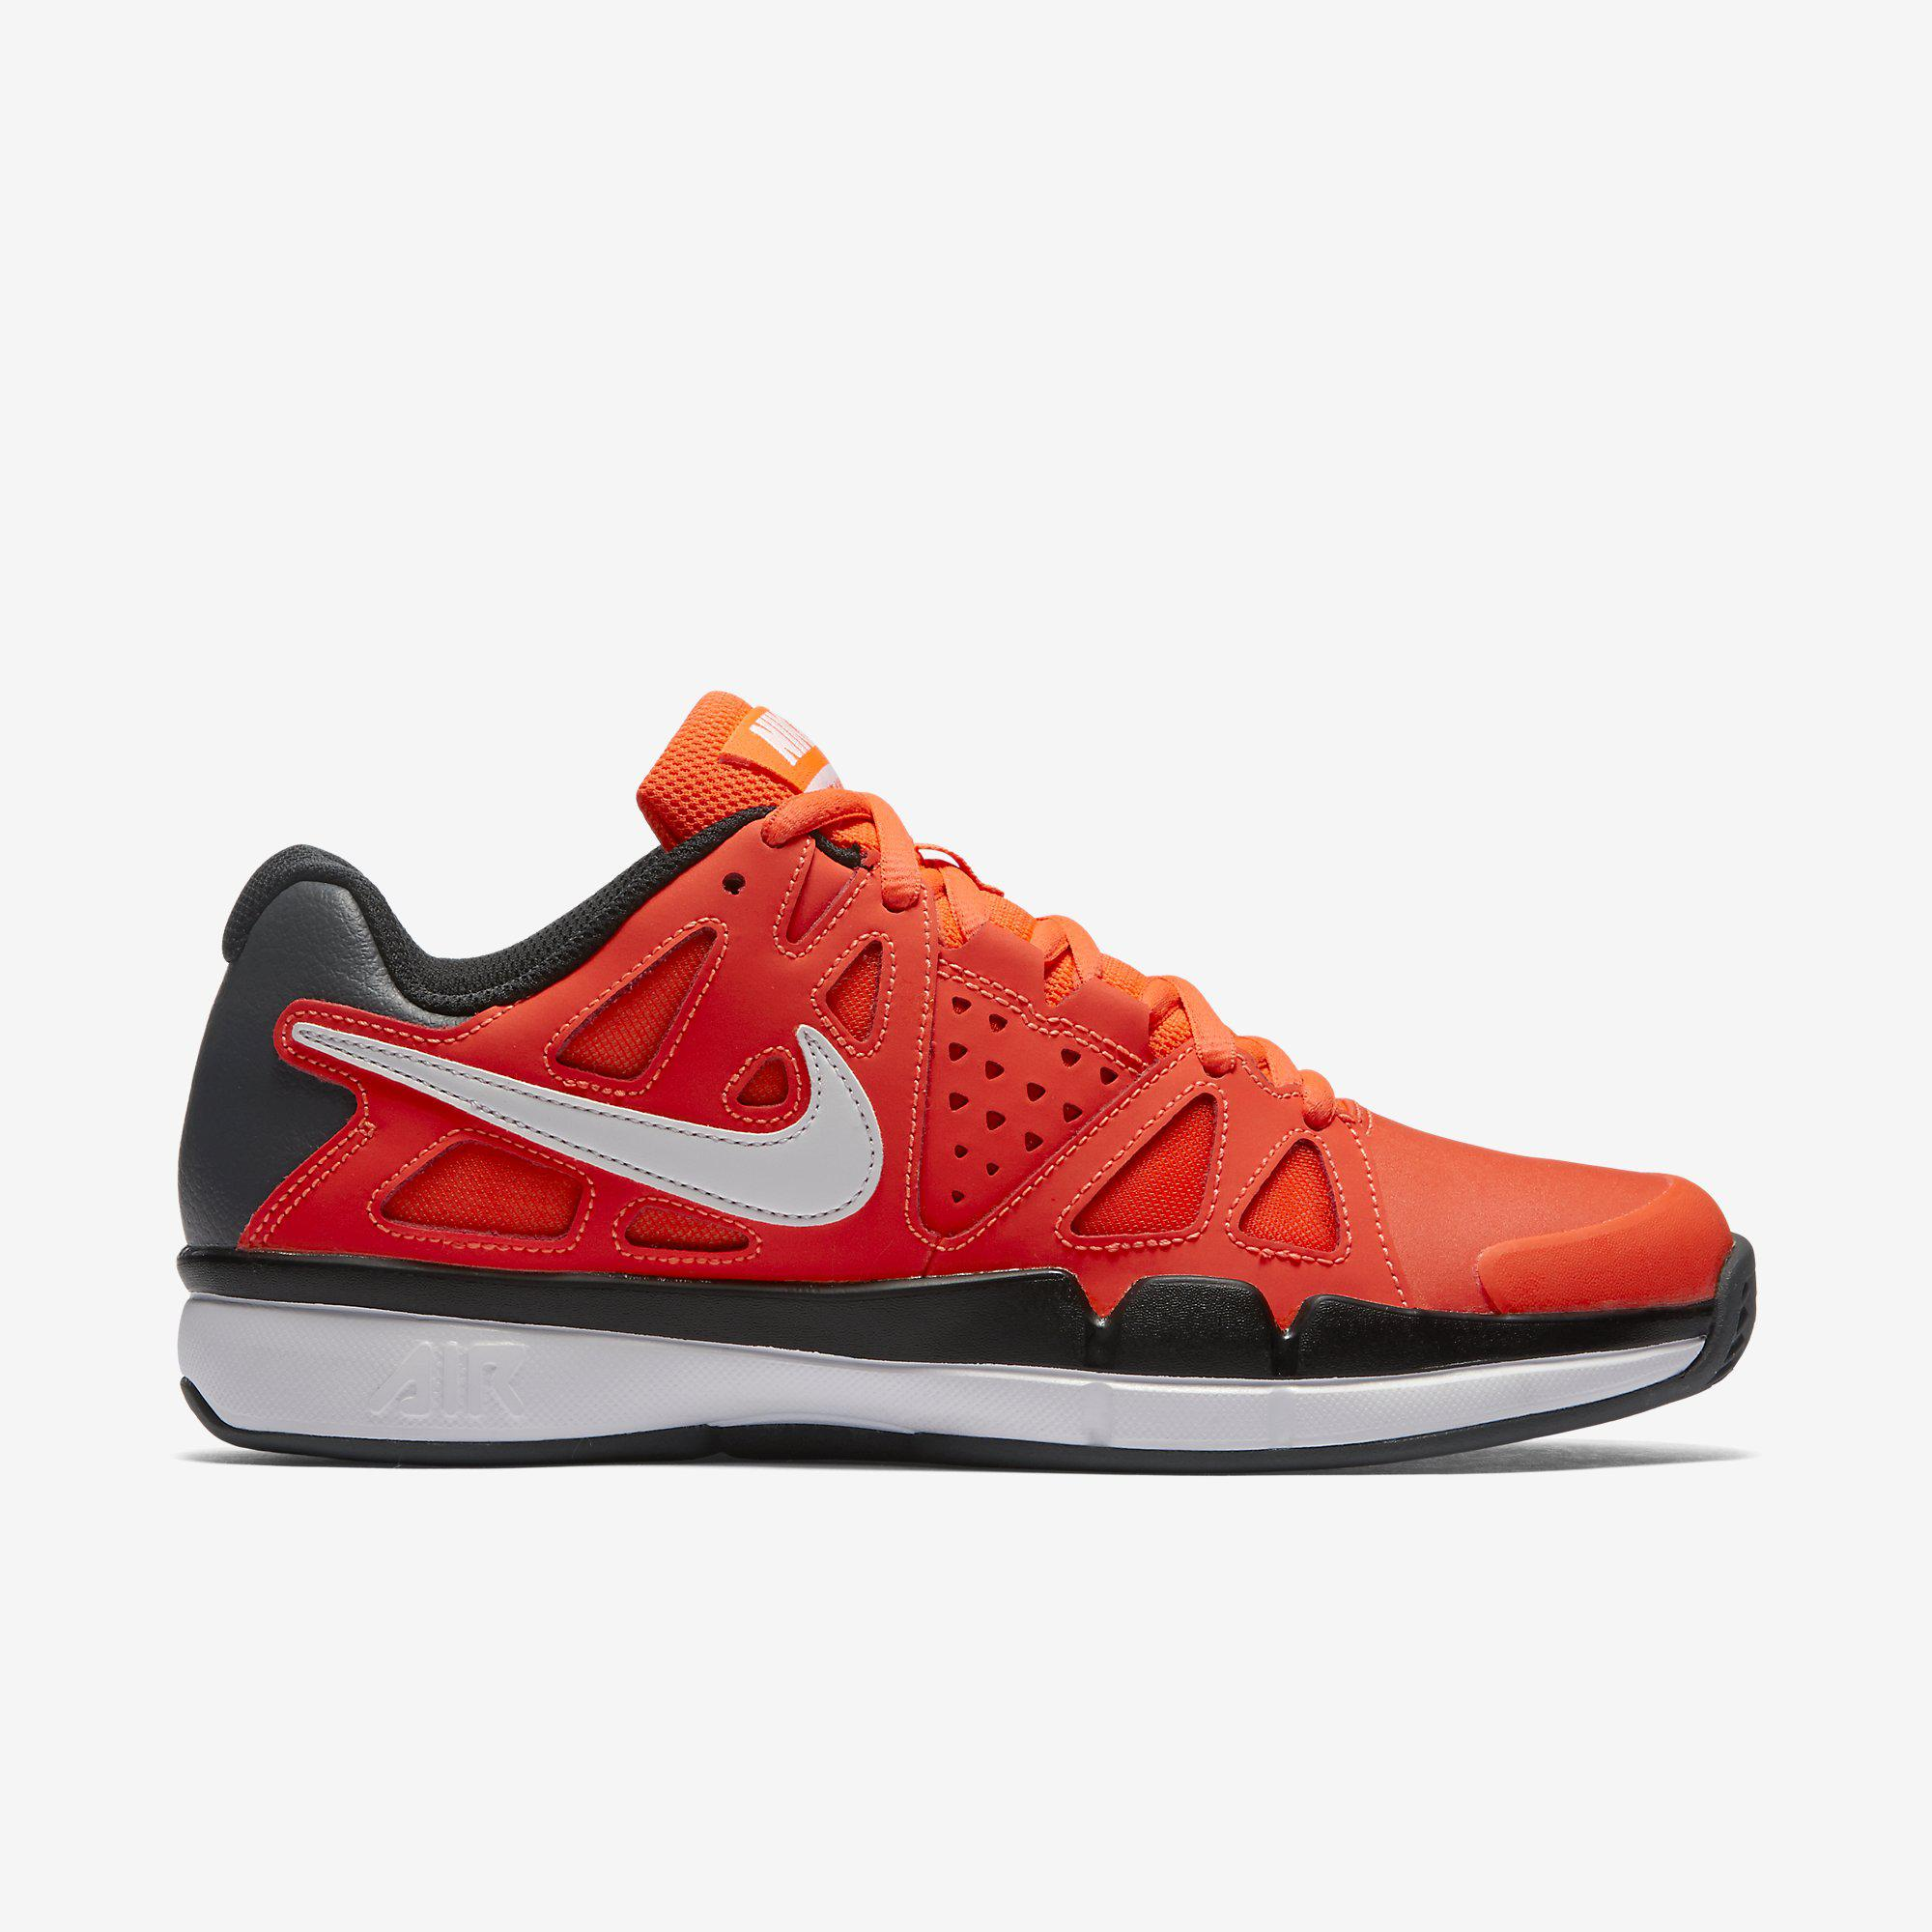 Nike Mens Air Vapor Advantage Clay Court Tennis Shoes - Red Black -  Tennisnuts.com 5440c4fca